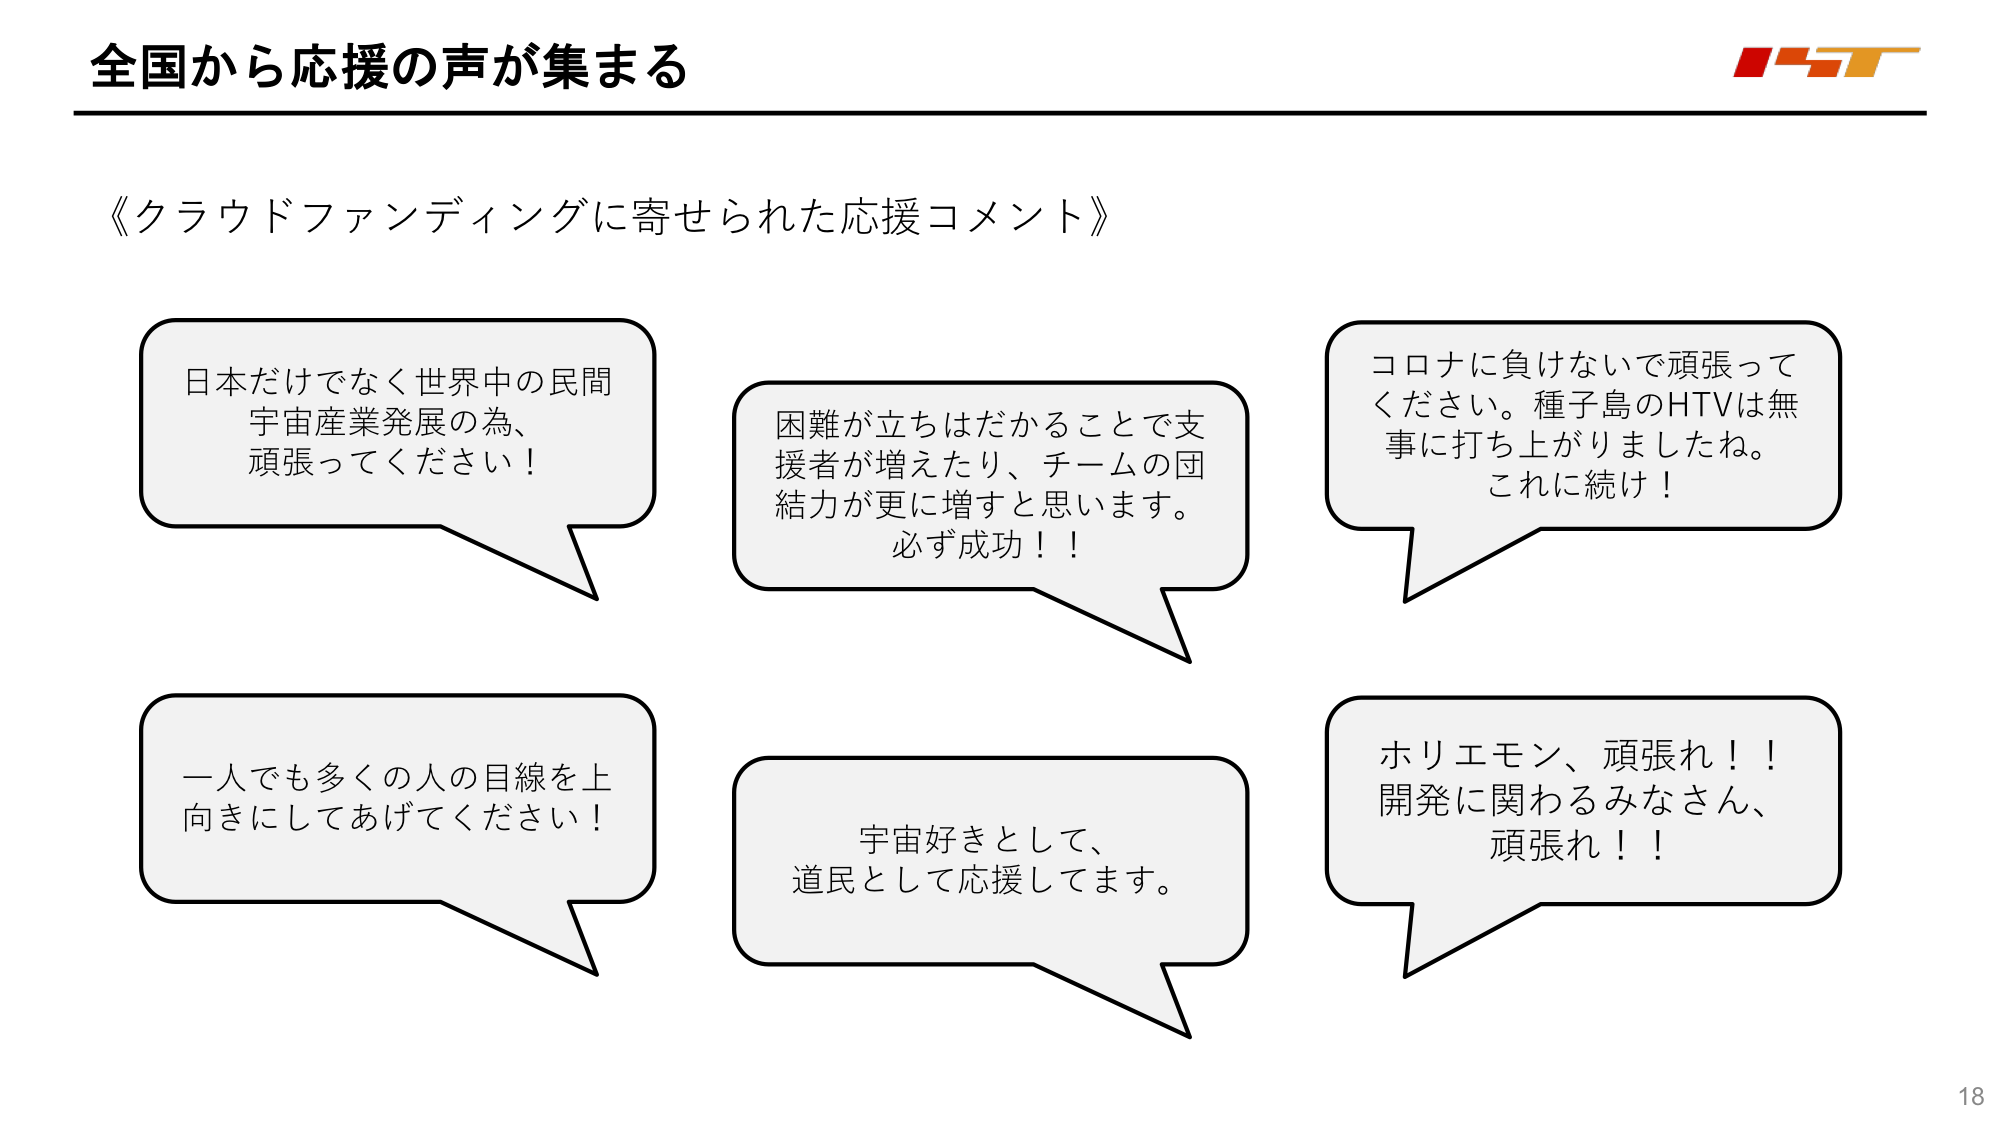 f:id:Imamura:20200603232857p:plain